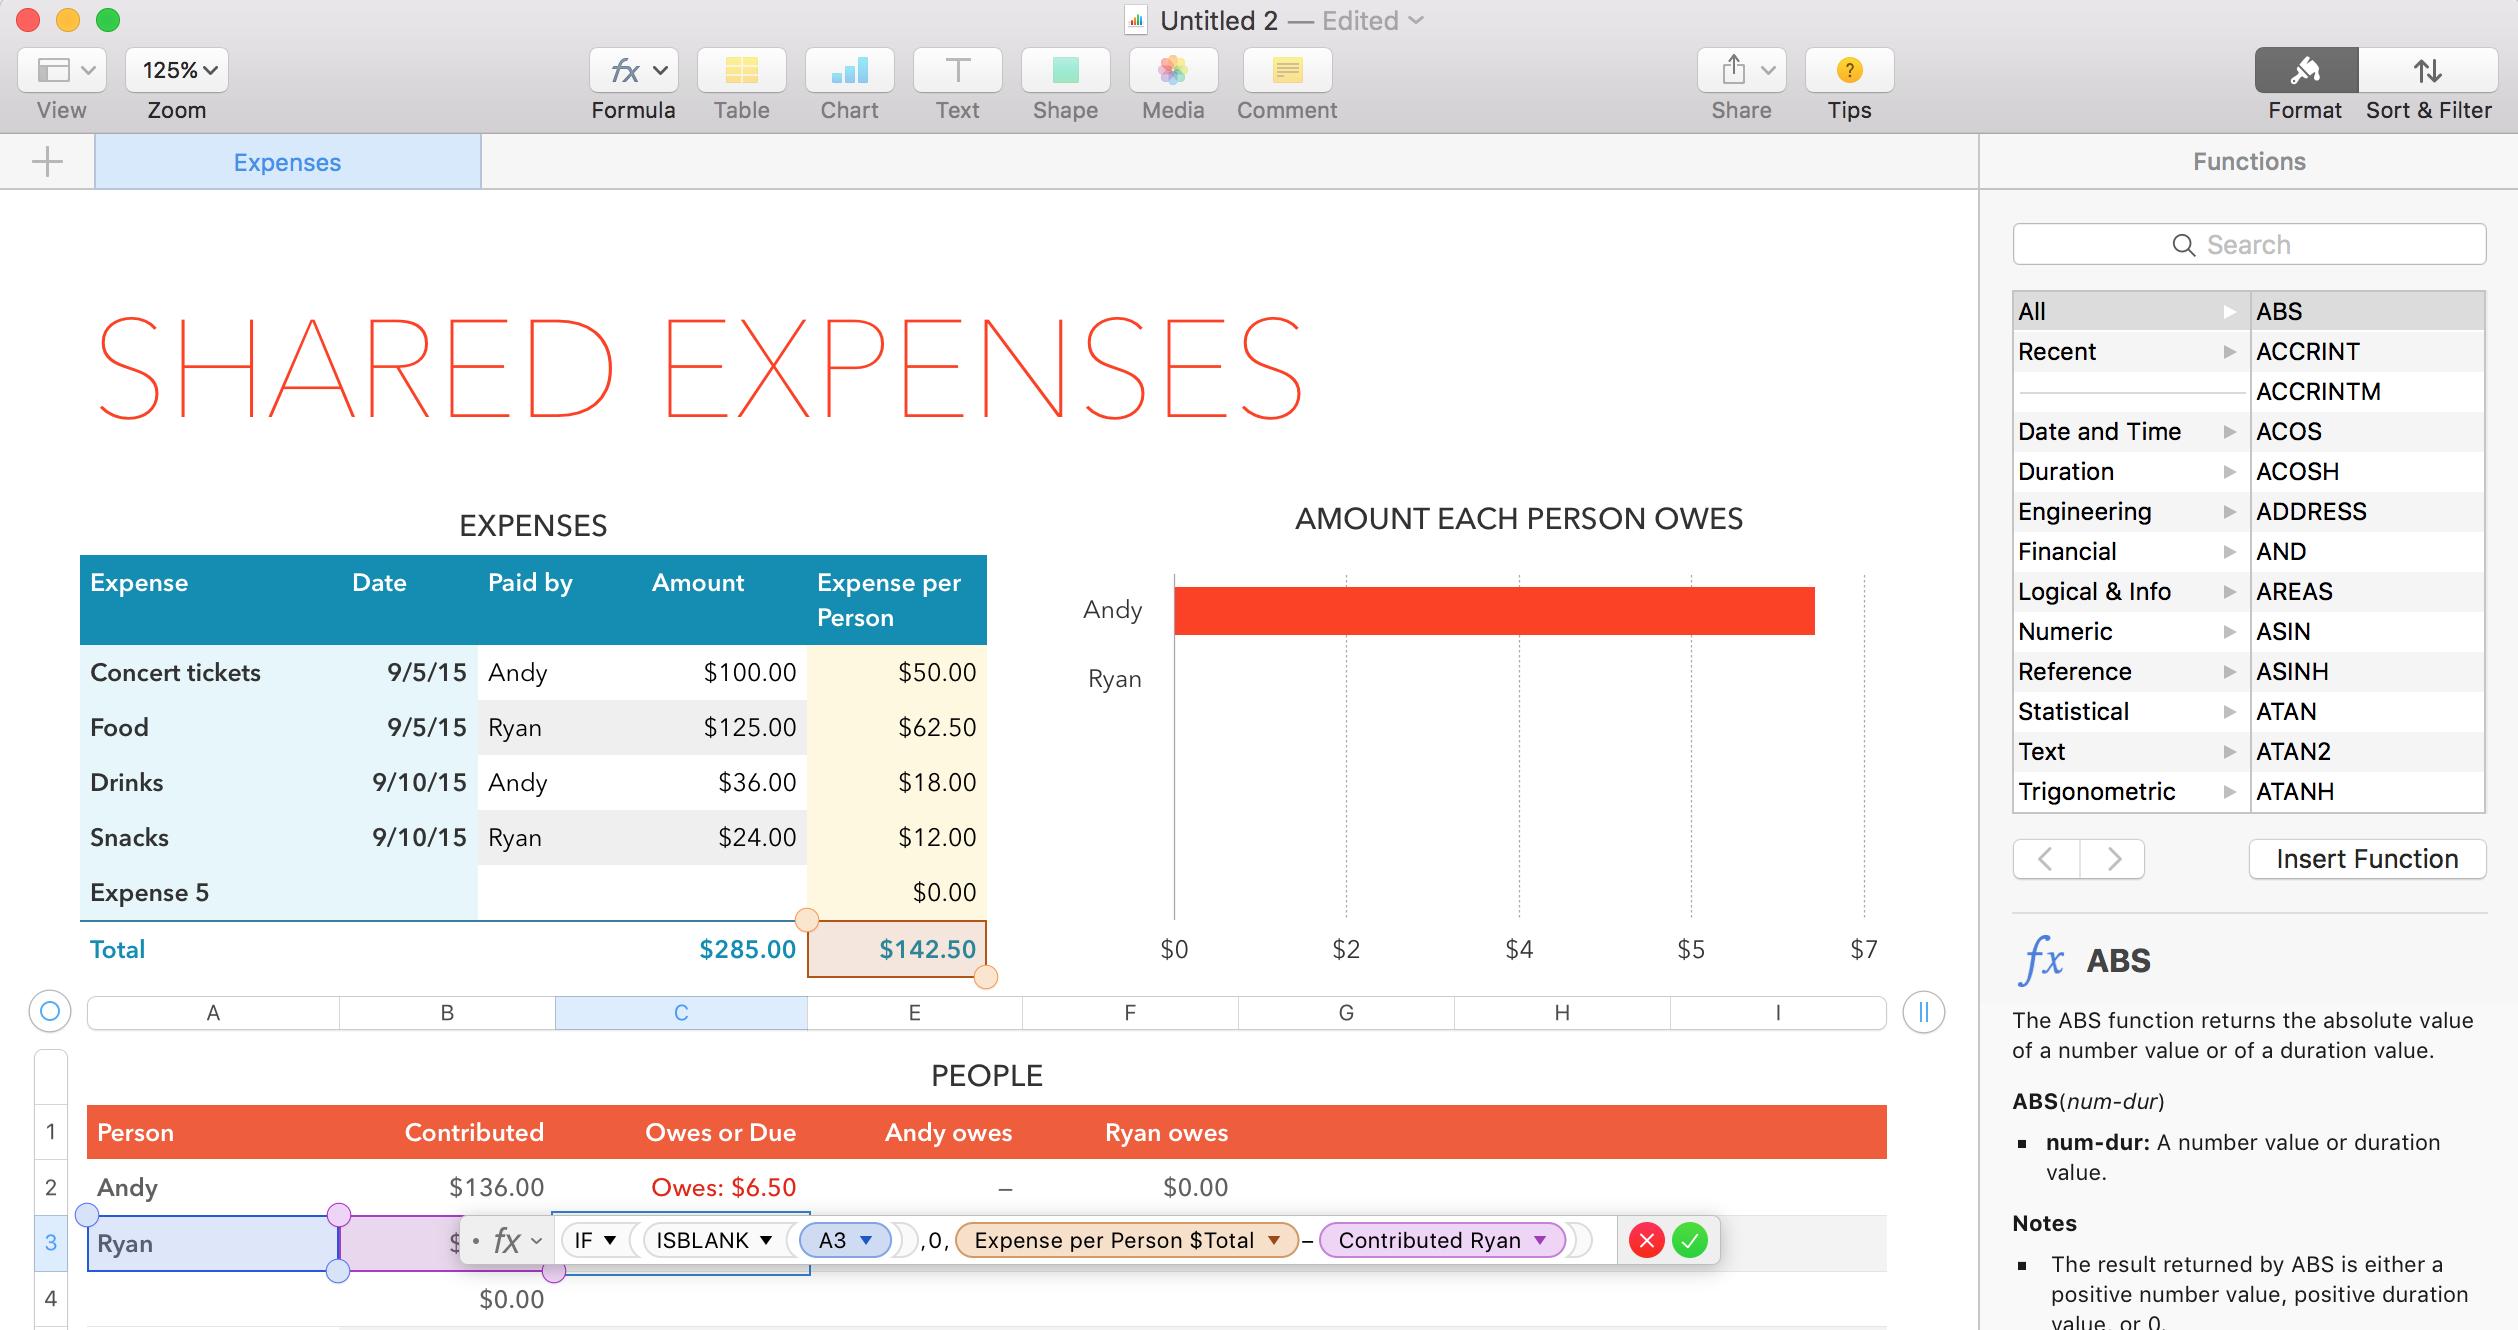 Spreadsheet Program For From Visicalc To Google Sheets: The 12 Best Spreadsheet Apps